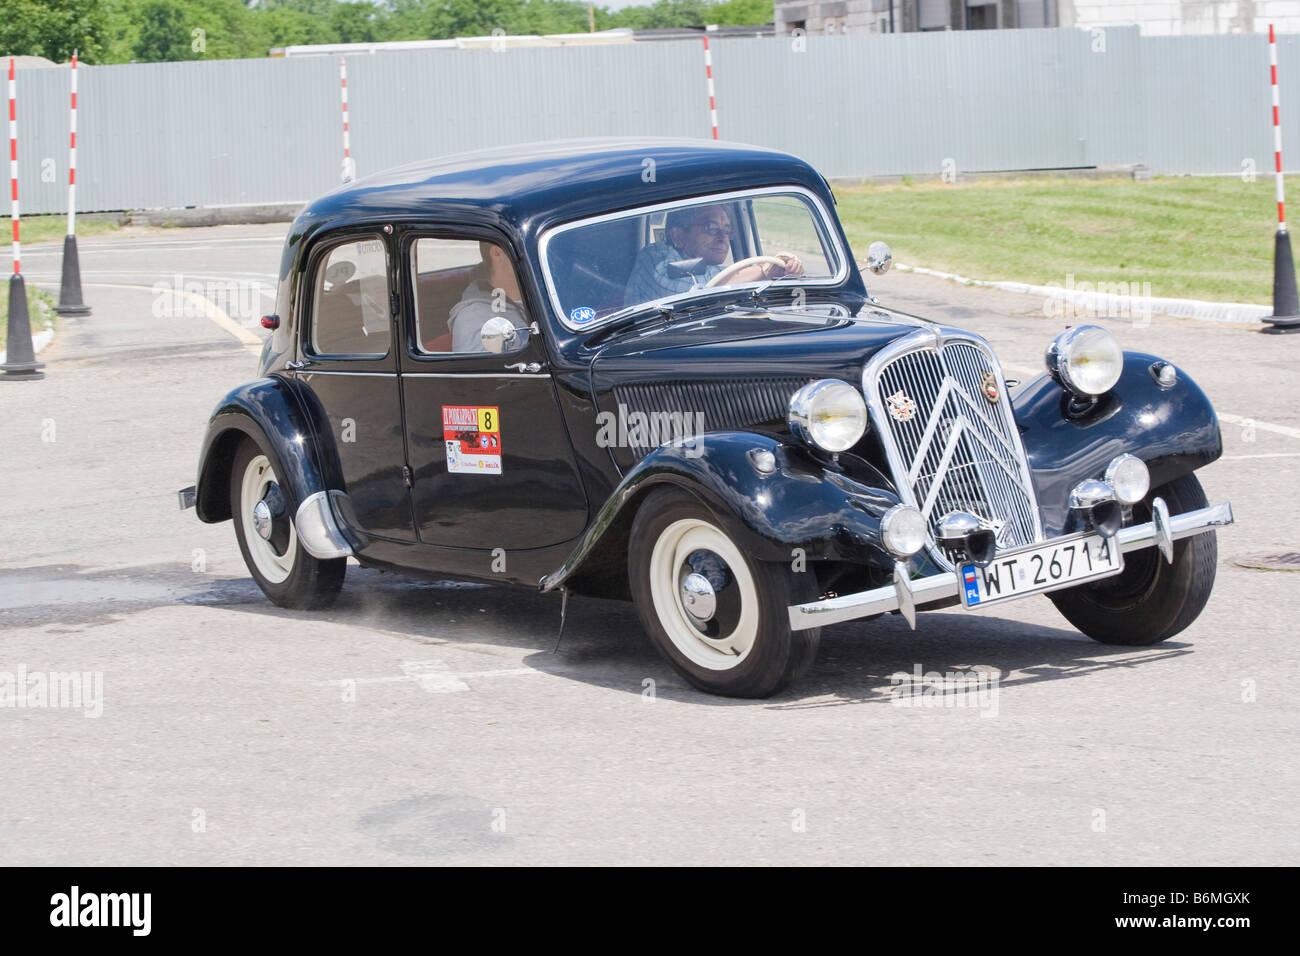 citroen bl 11 1954 11 4cv traction avant stock photo royalty free image 21350635 alamy. Black Bedroom Furniture Sets. Home Design Ideas